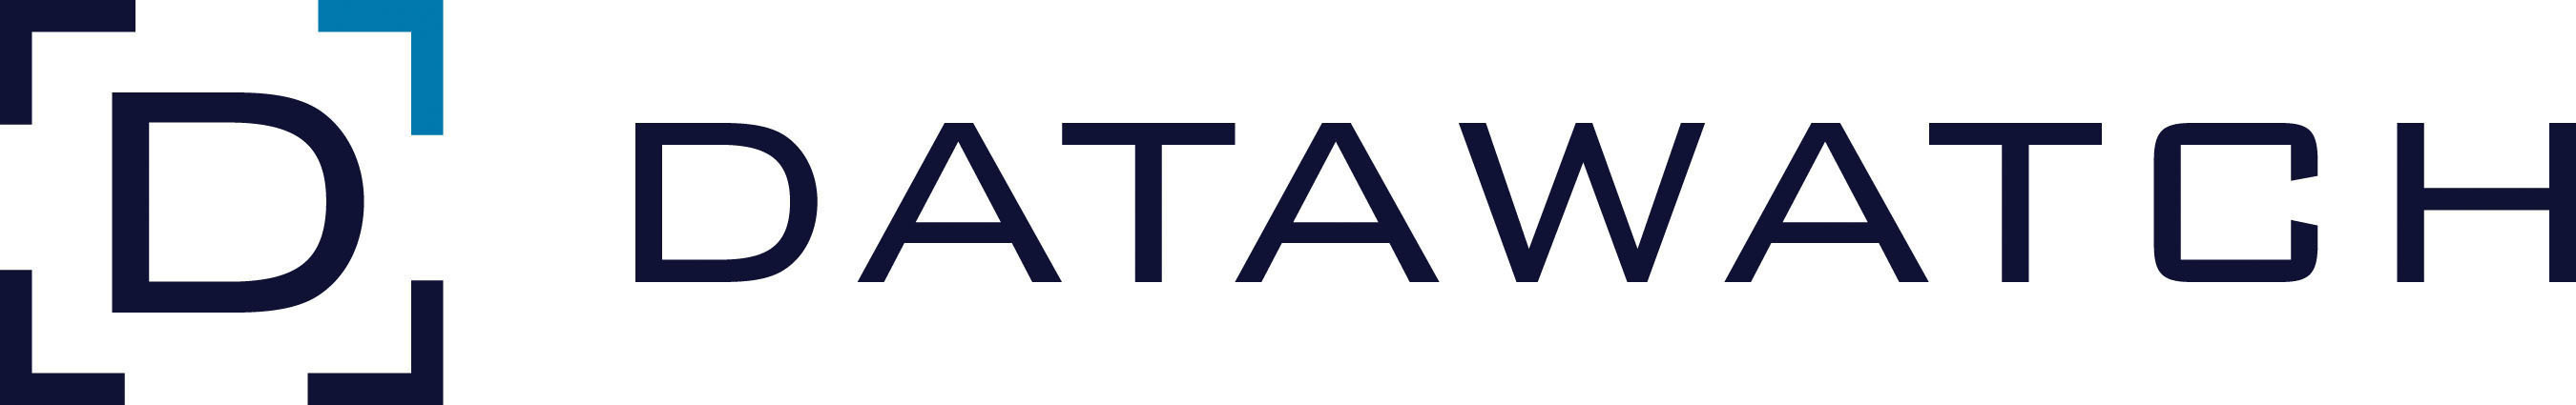 Datawatch logo.